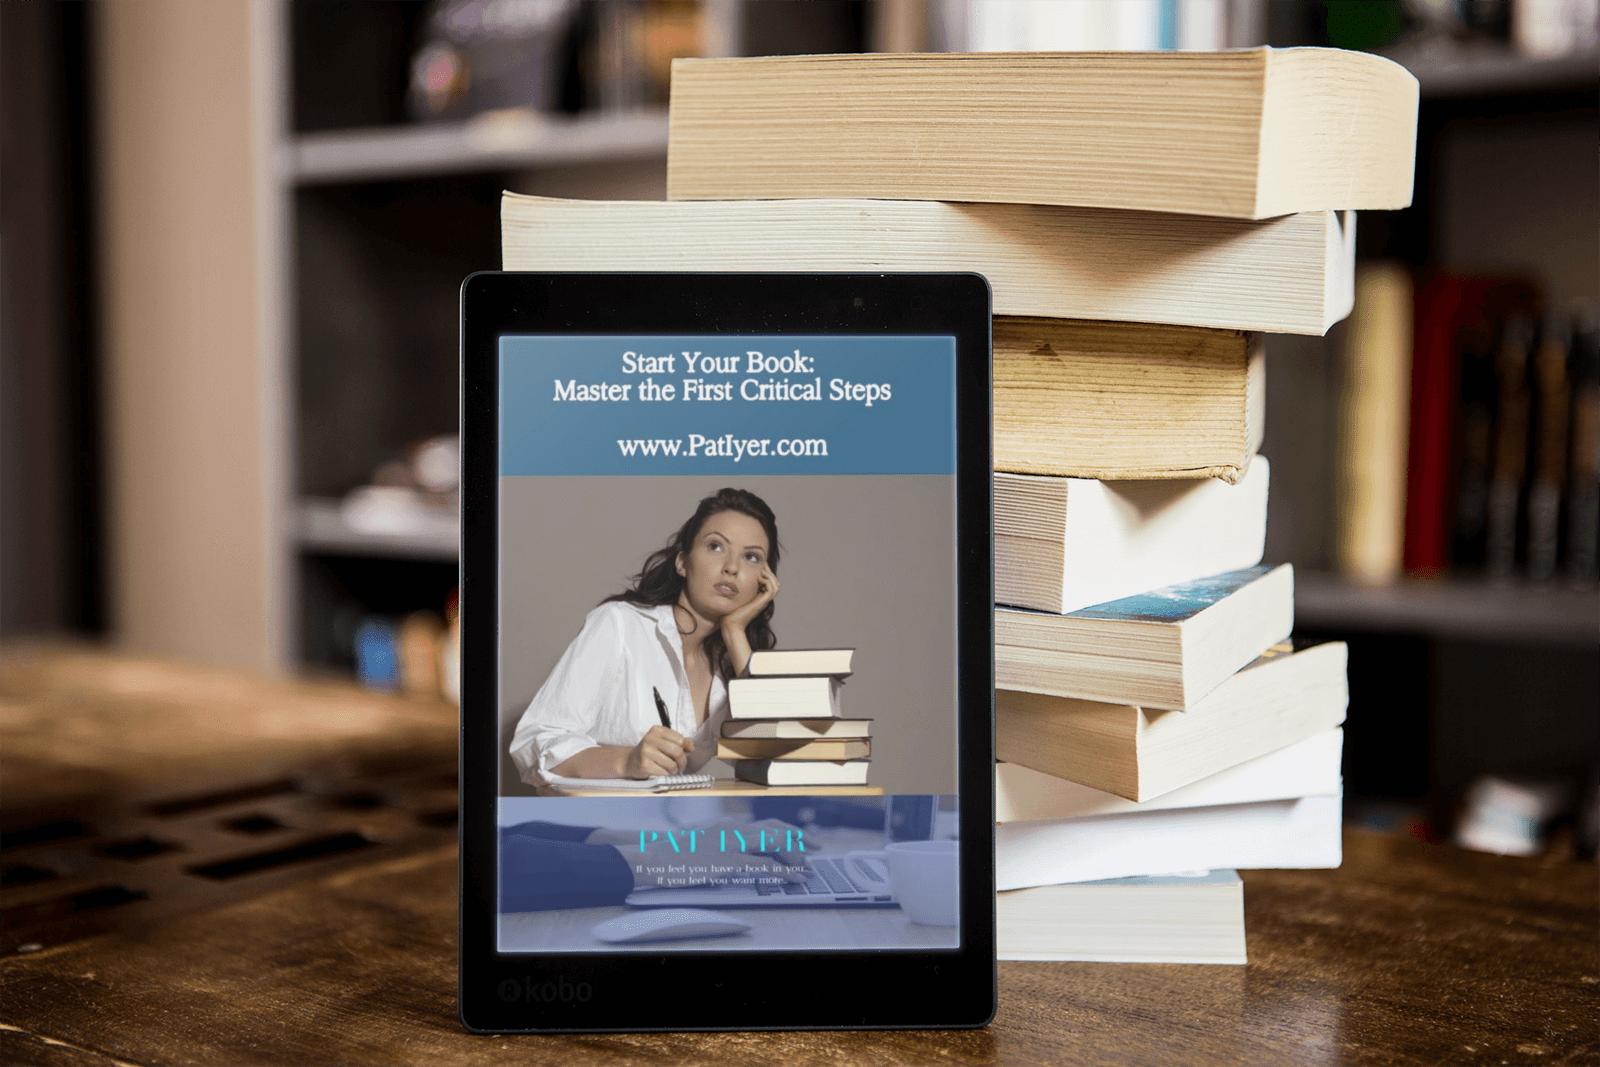 Start Your Book Webinar image